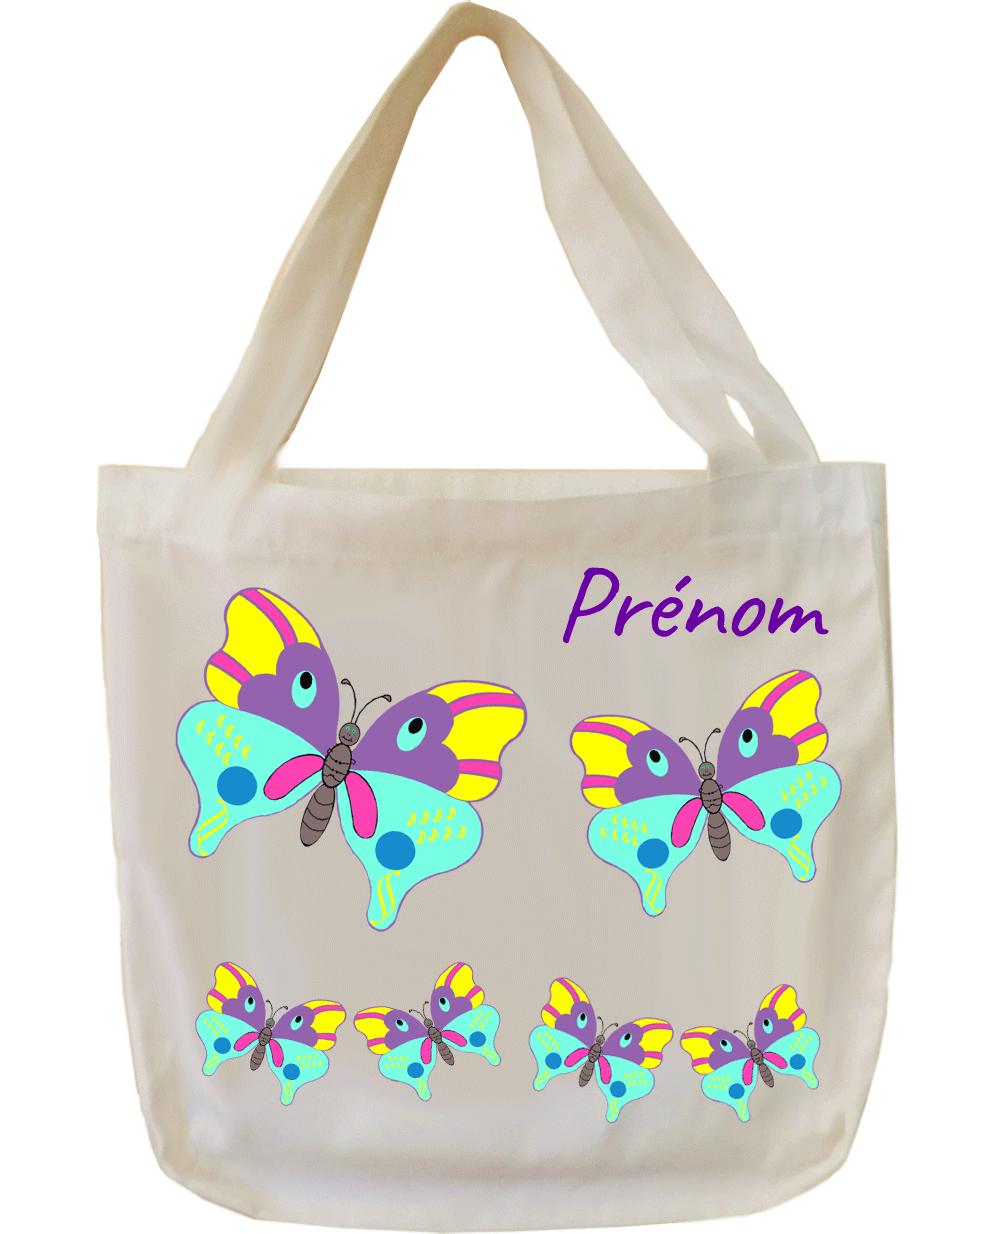 tote-bag;sac;cabas;texti;cadeaux;personnalisable;personnalisation;personnalise;prenom;animal;papillon